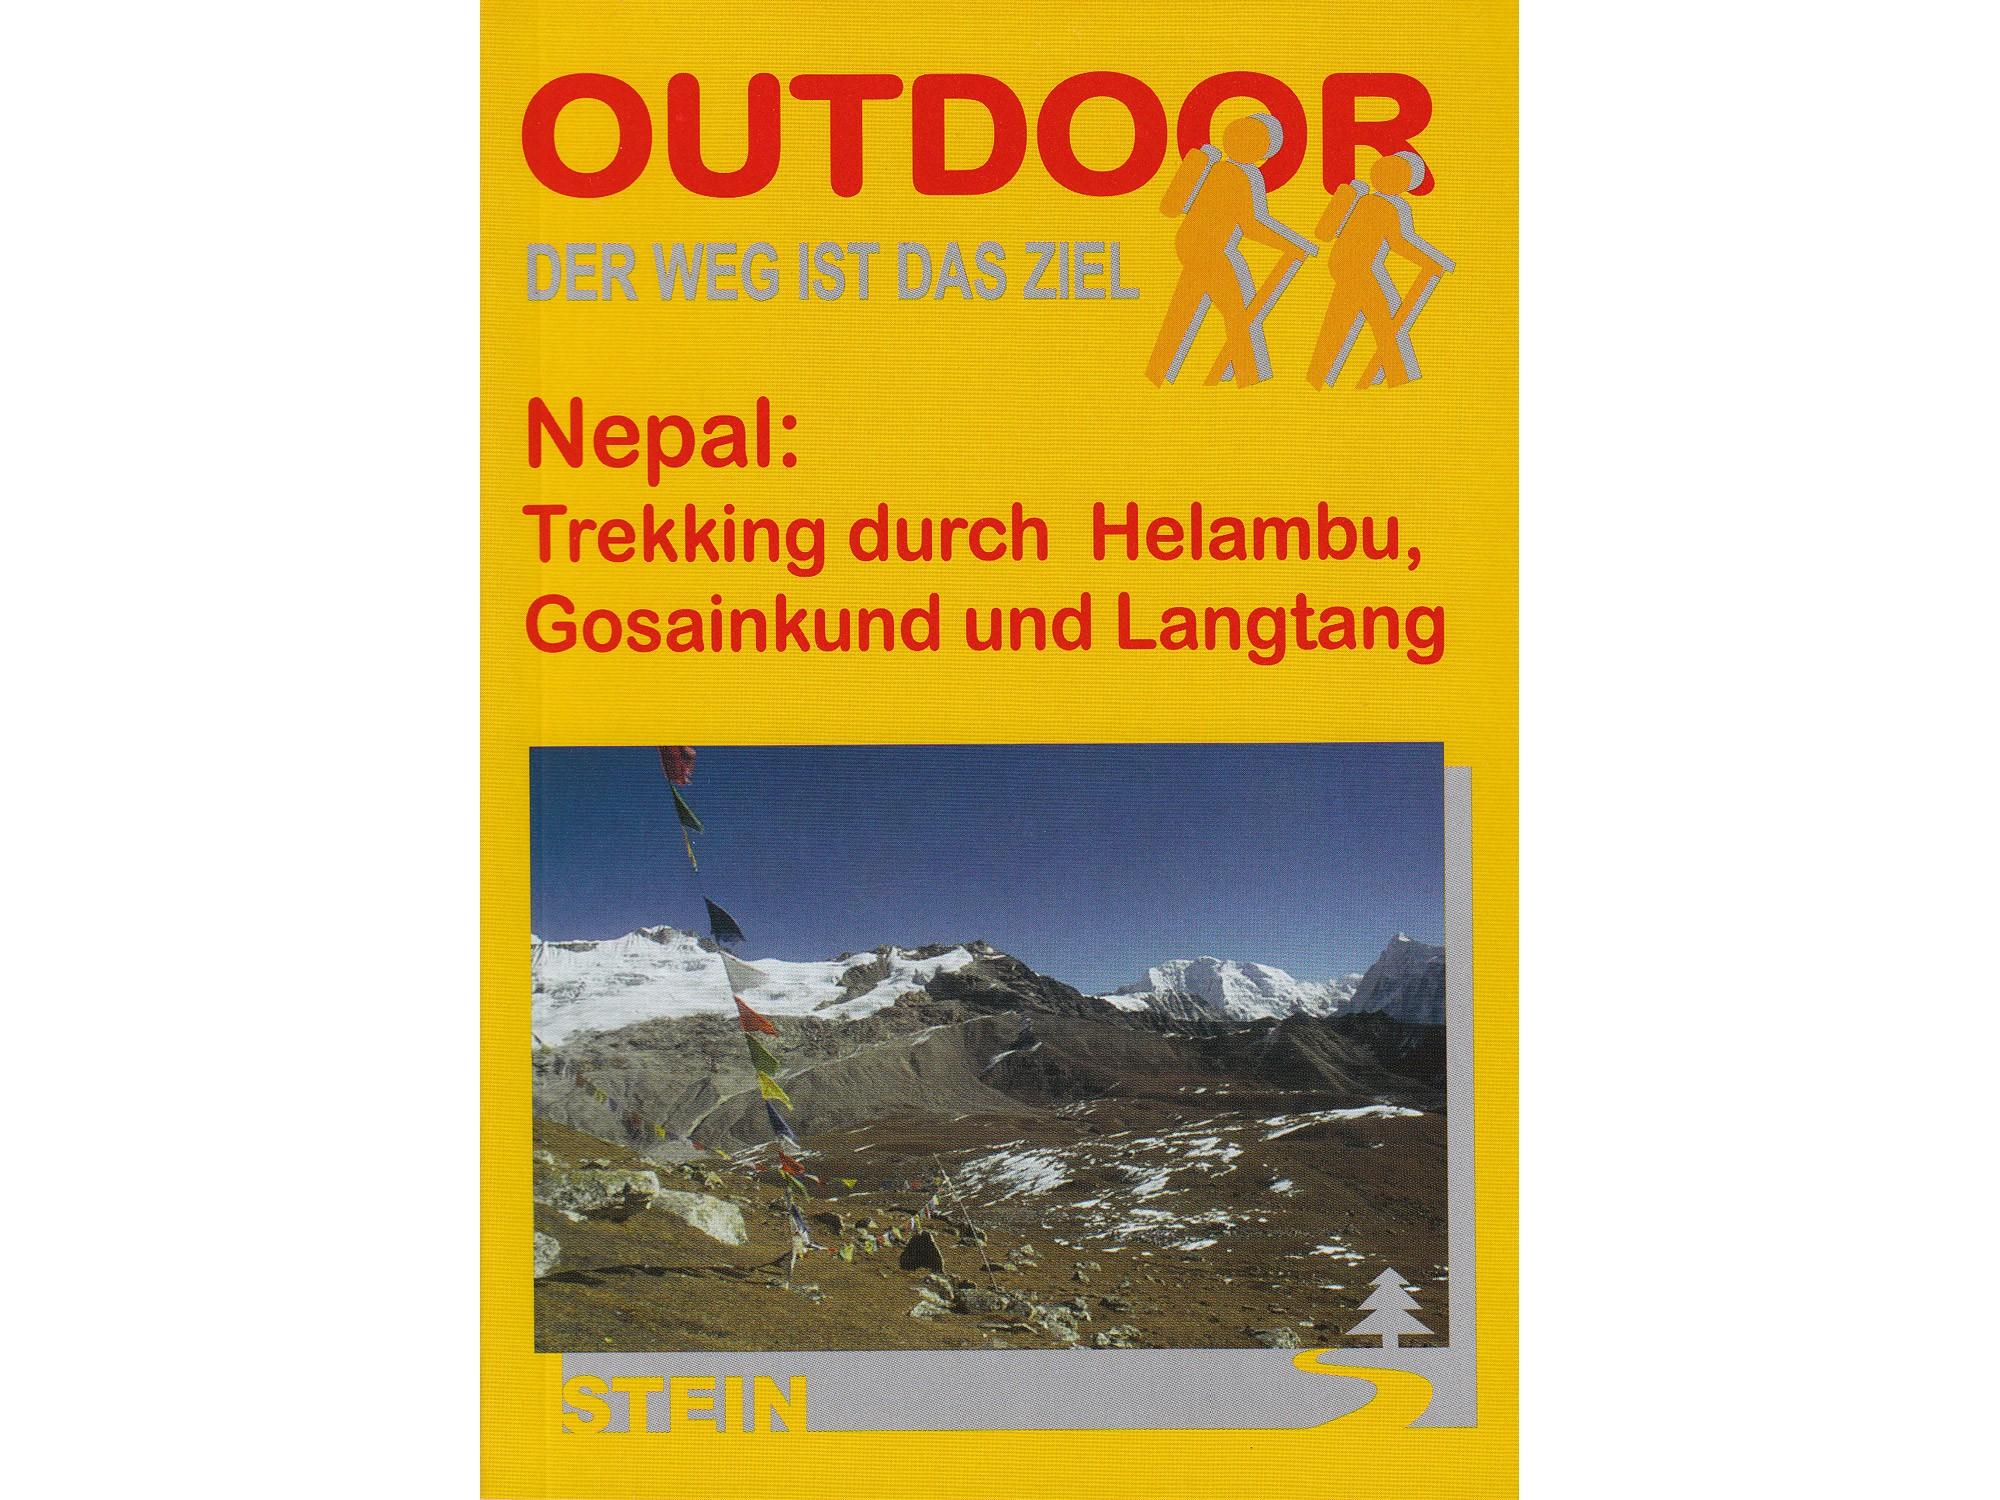 Conrad Stein Verlag Nepal:Trekking in Helambu..